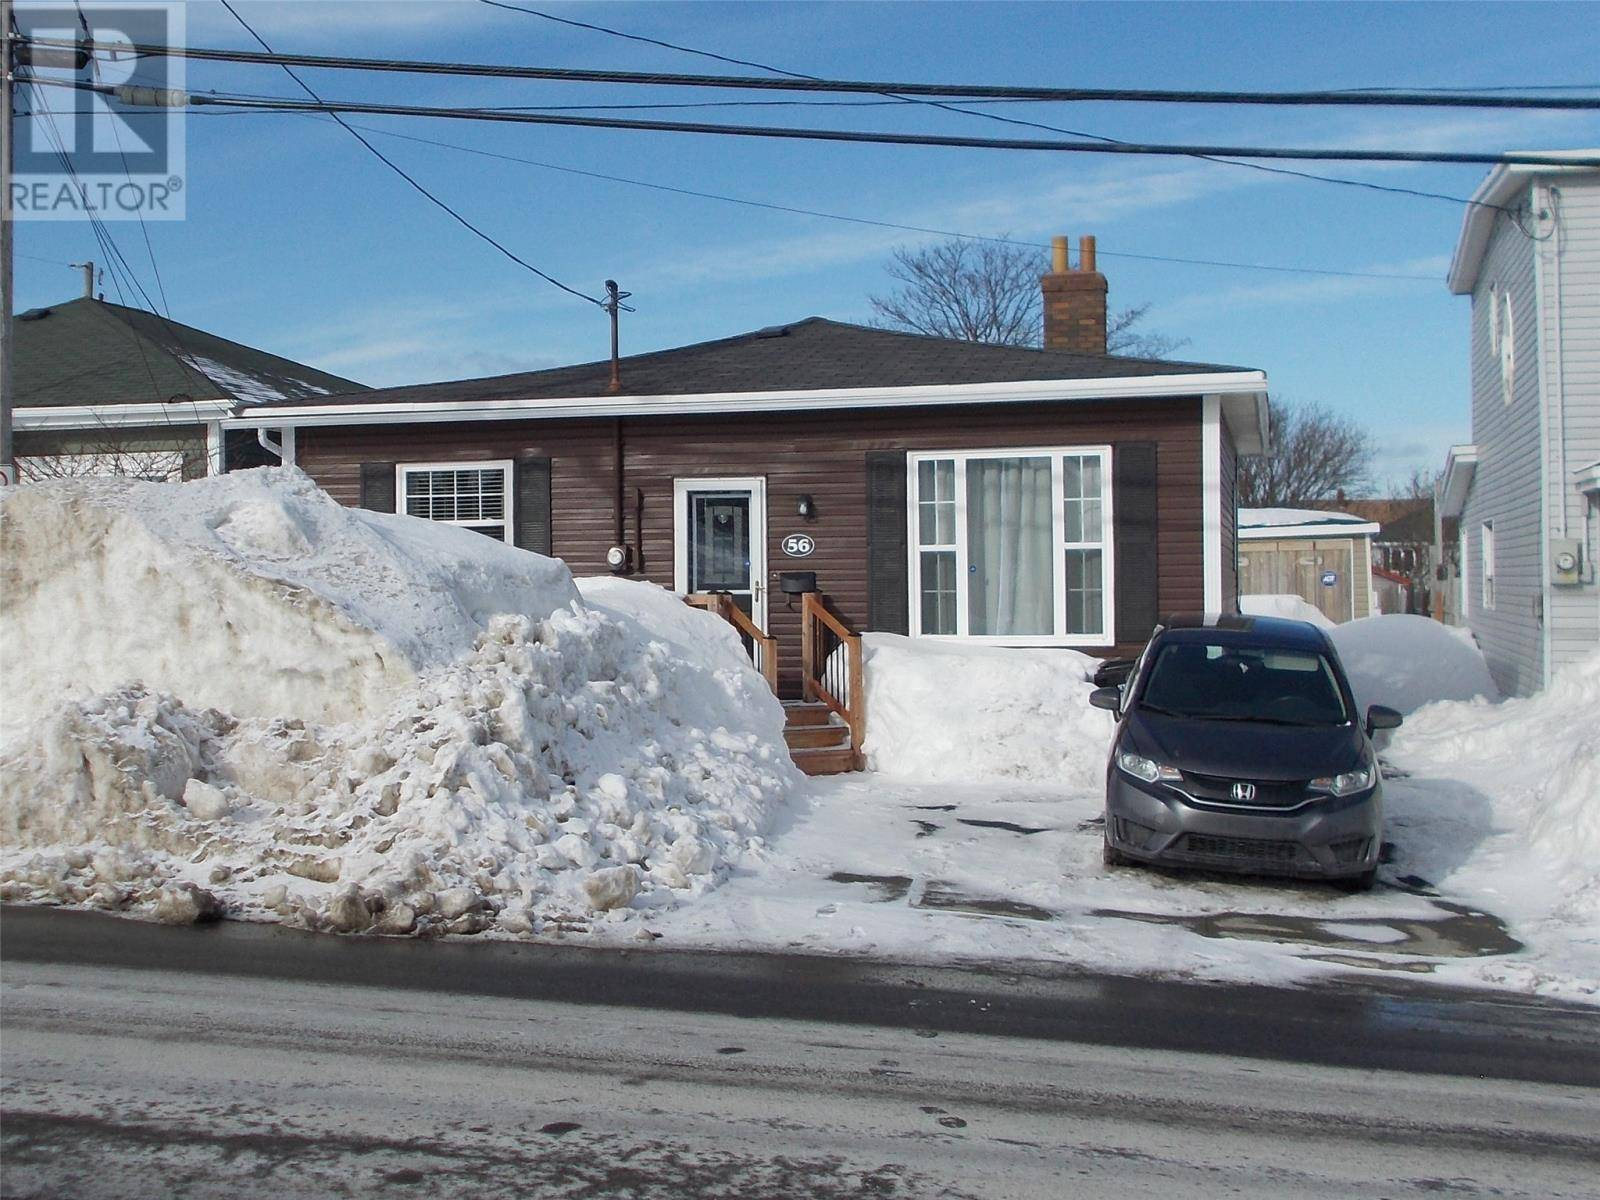 House for sale at 56 Blackmarsh Rd St. John's Newfoundland - MLS: 1211203